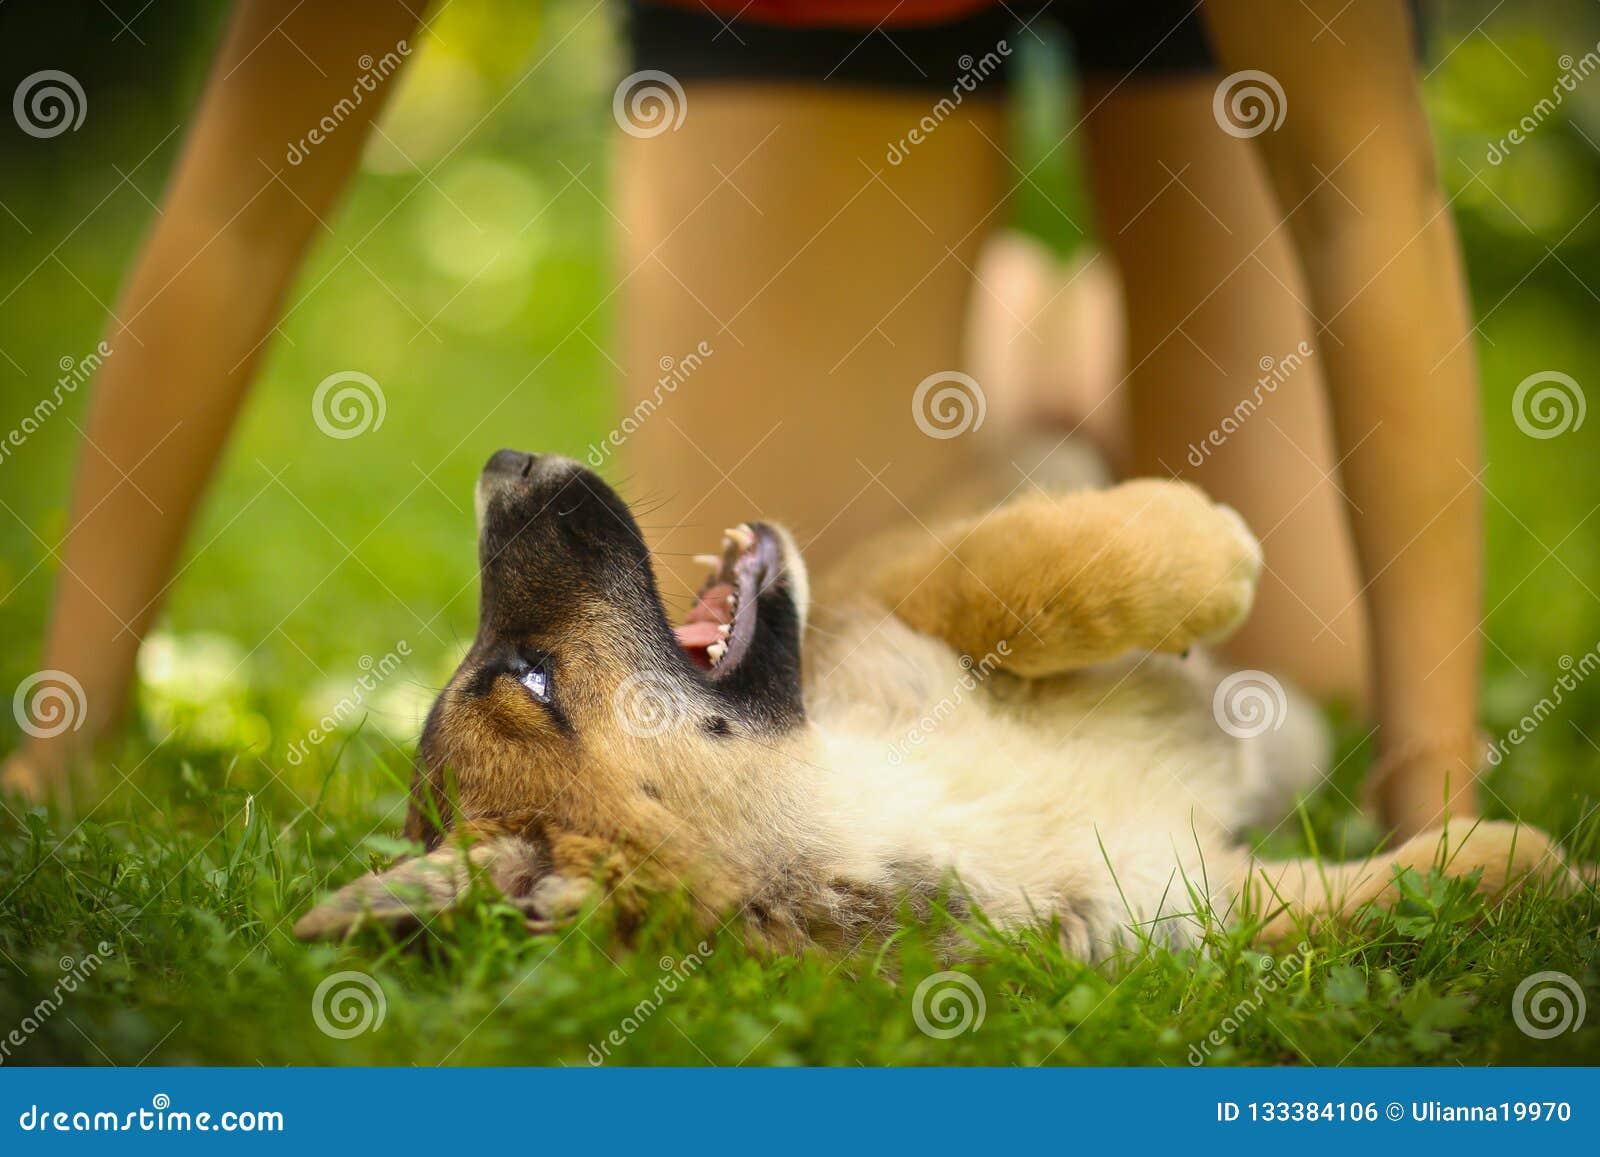 Teenager girl hug puppy shepherd dog close up photo